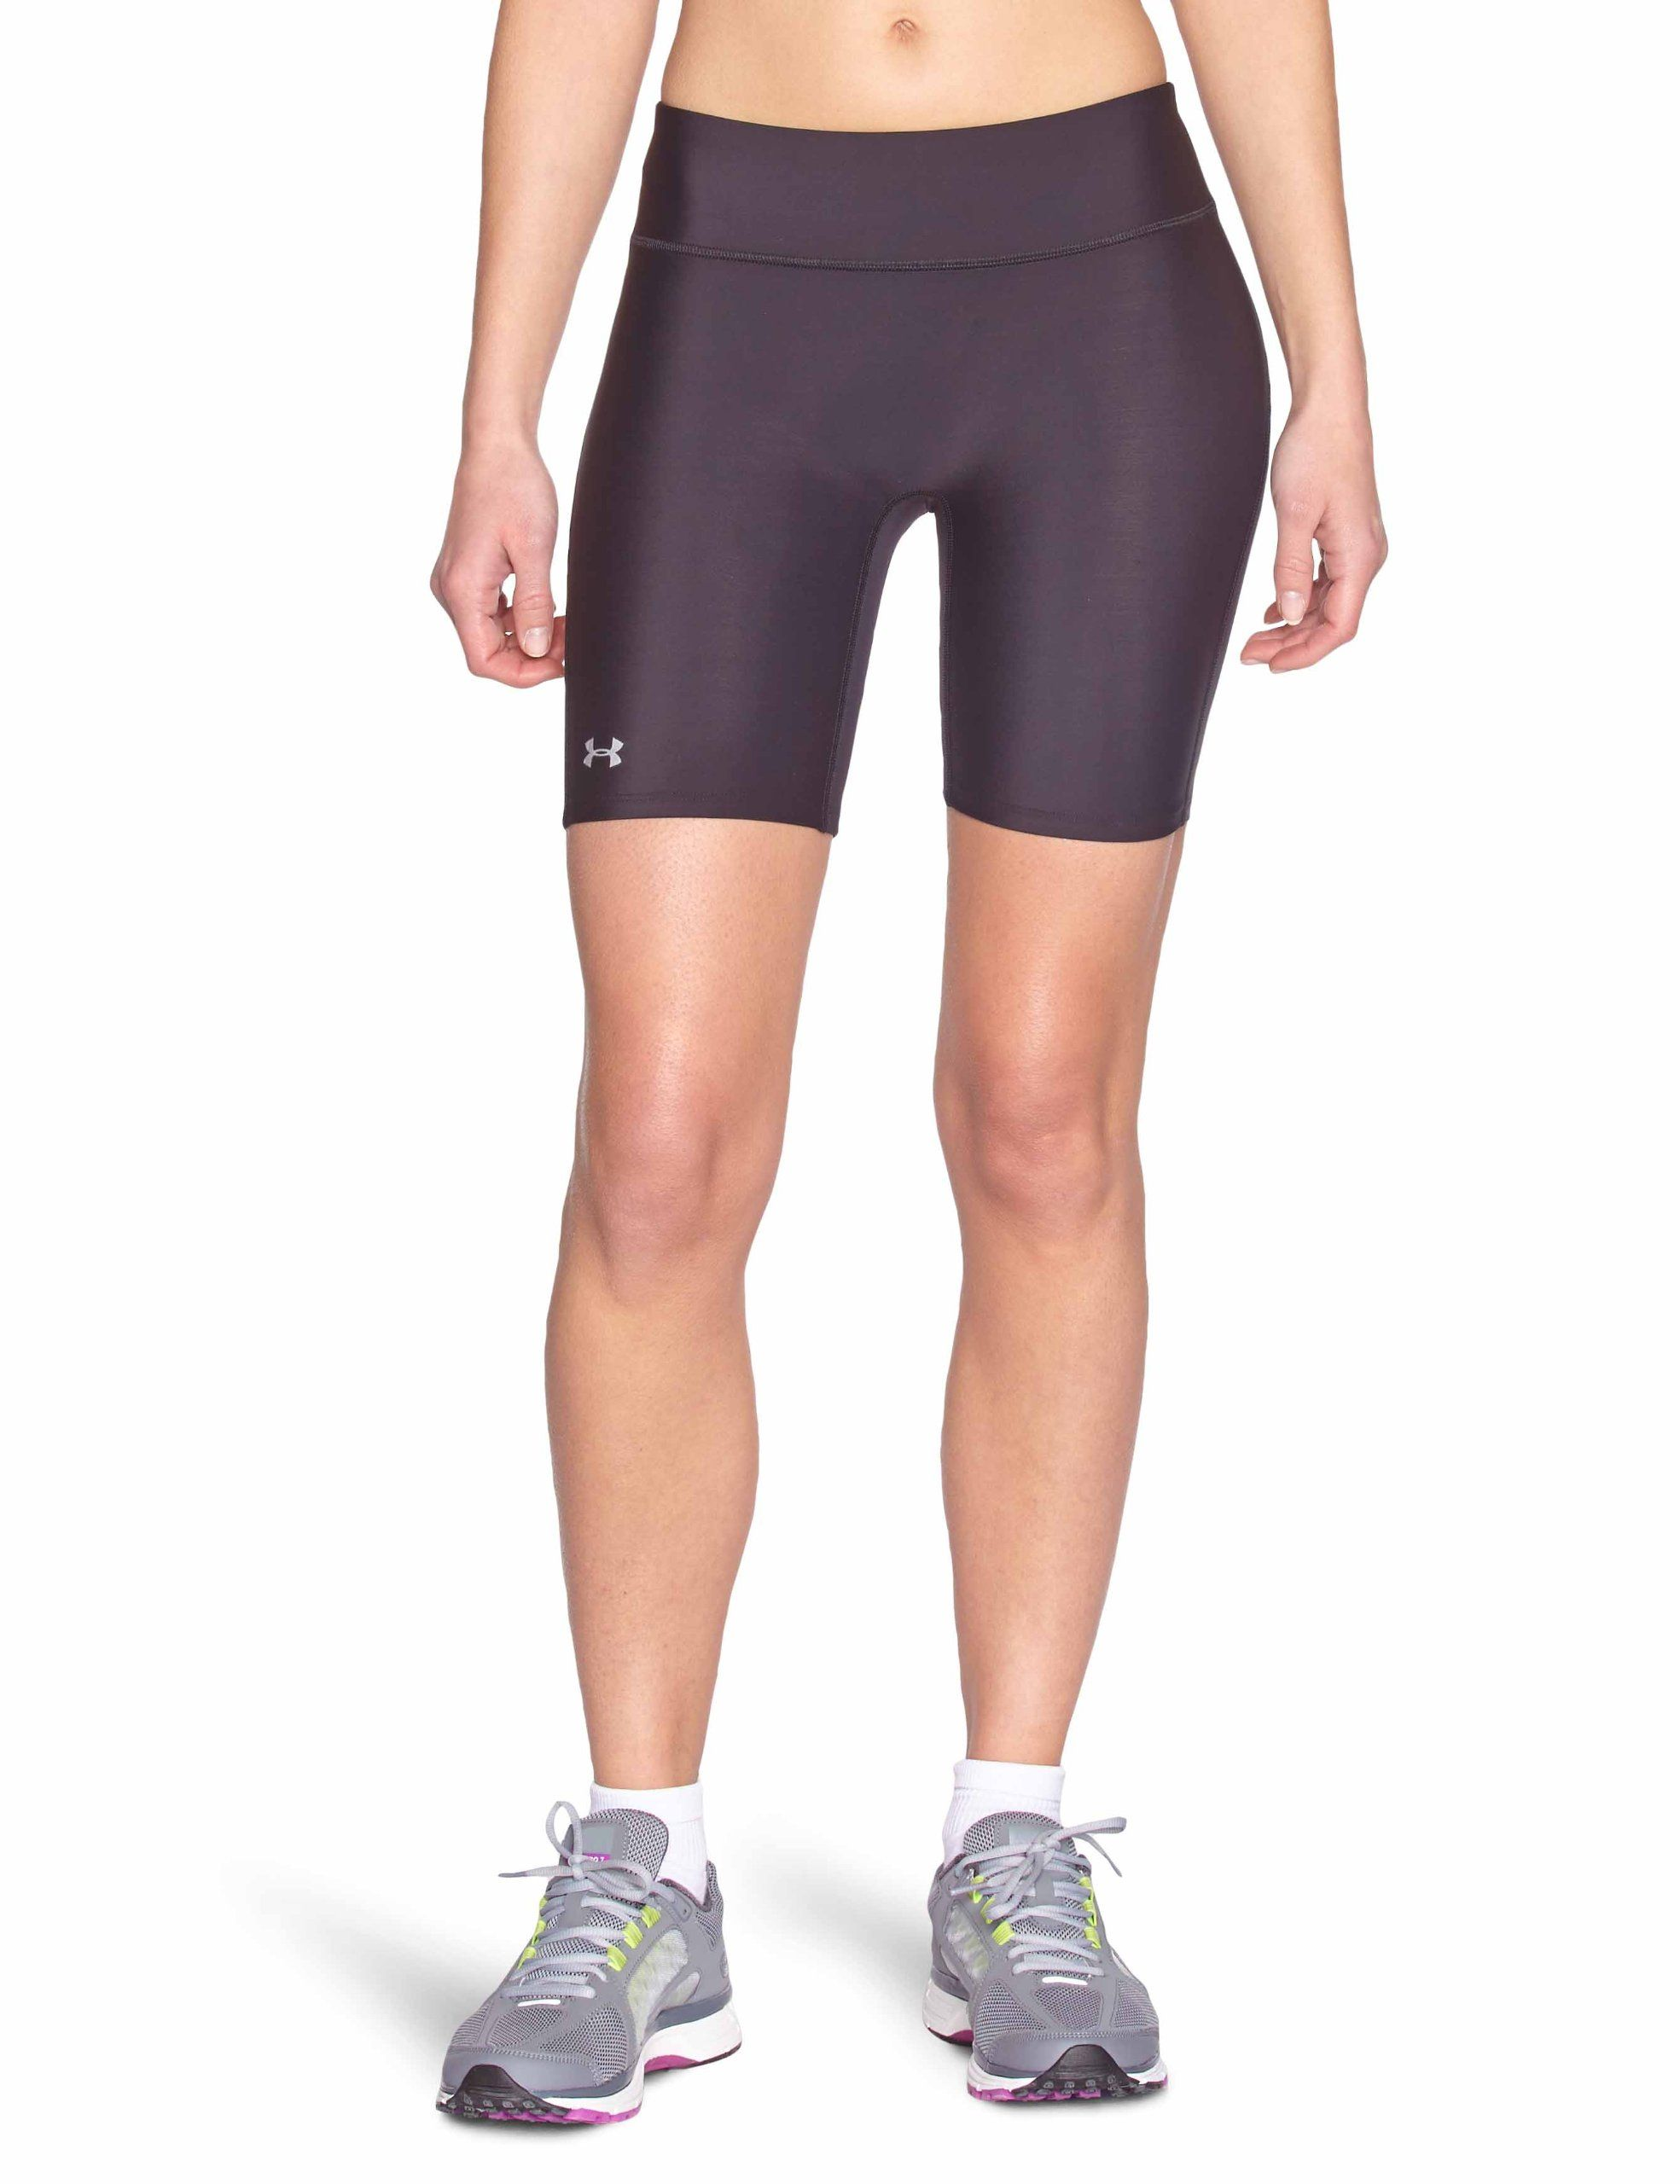 Quedar asombrado Guiño Pegajoso  Amazon.com: Under Armour Women's Authentic Long 7'' Compression Shorts:  Sports & Outdoors | Compression clothing, Stylish activewear, Under armour  women